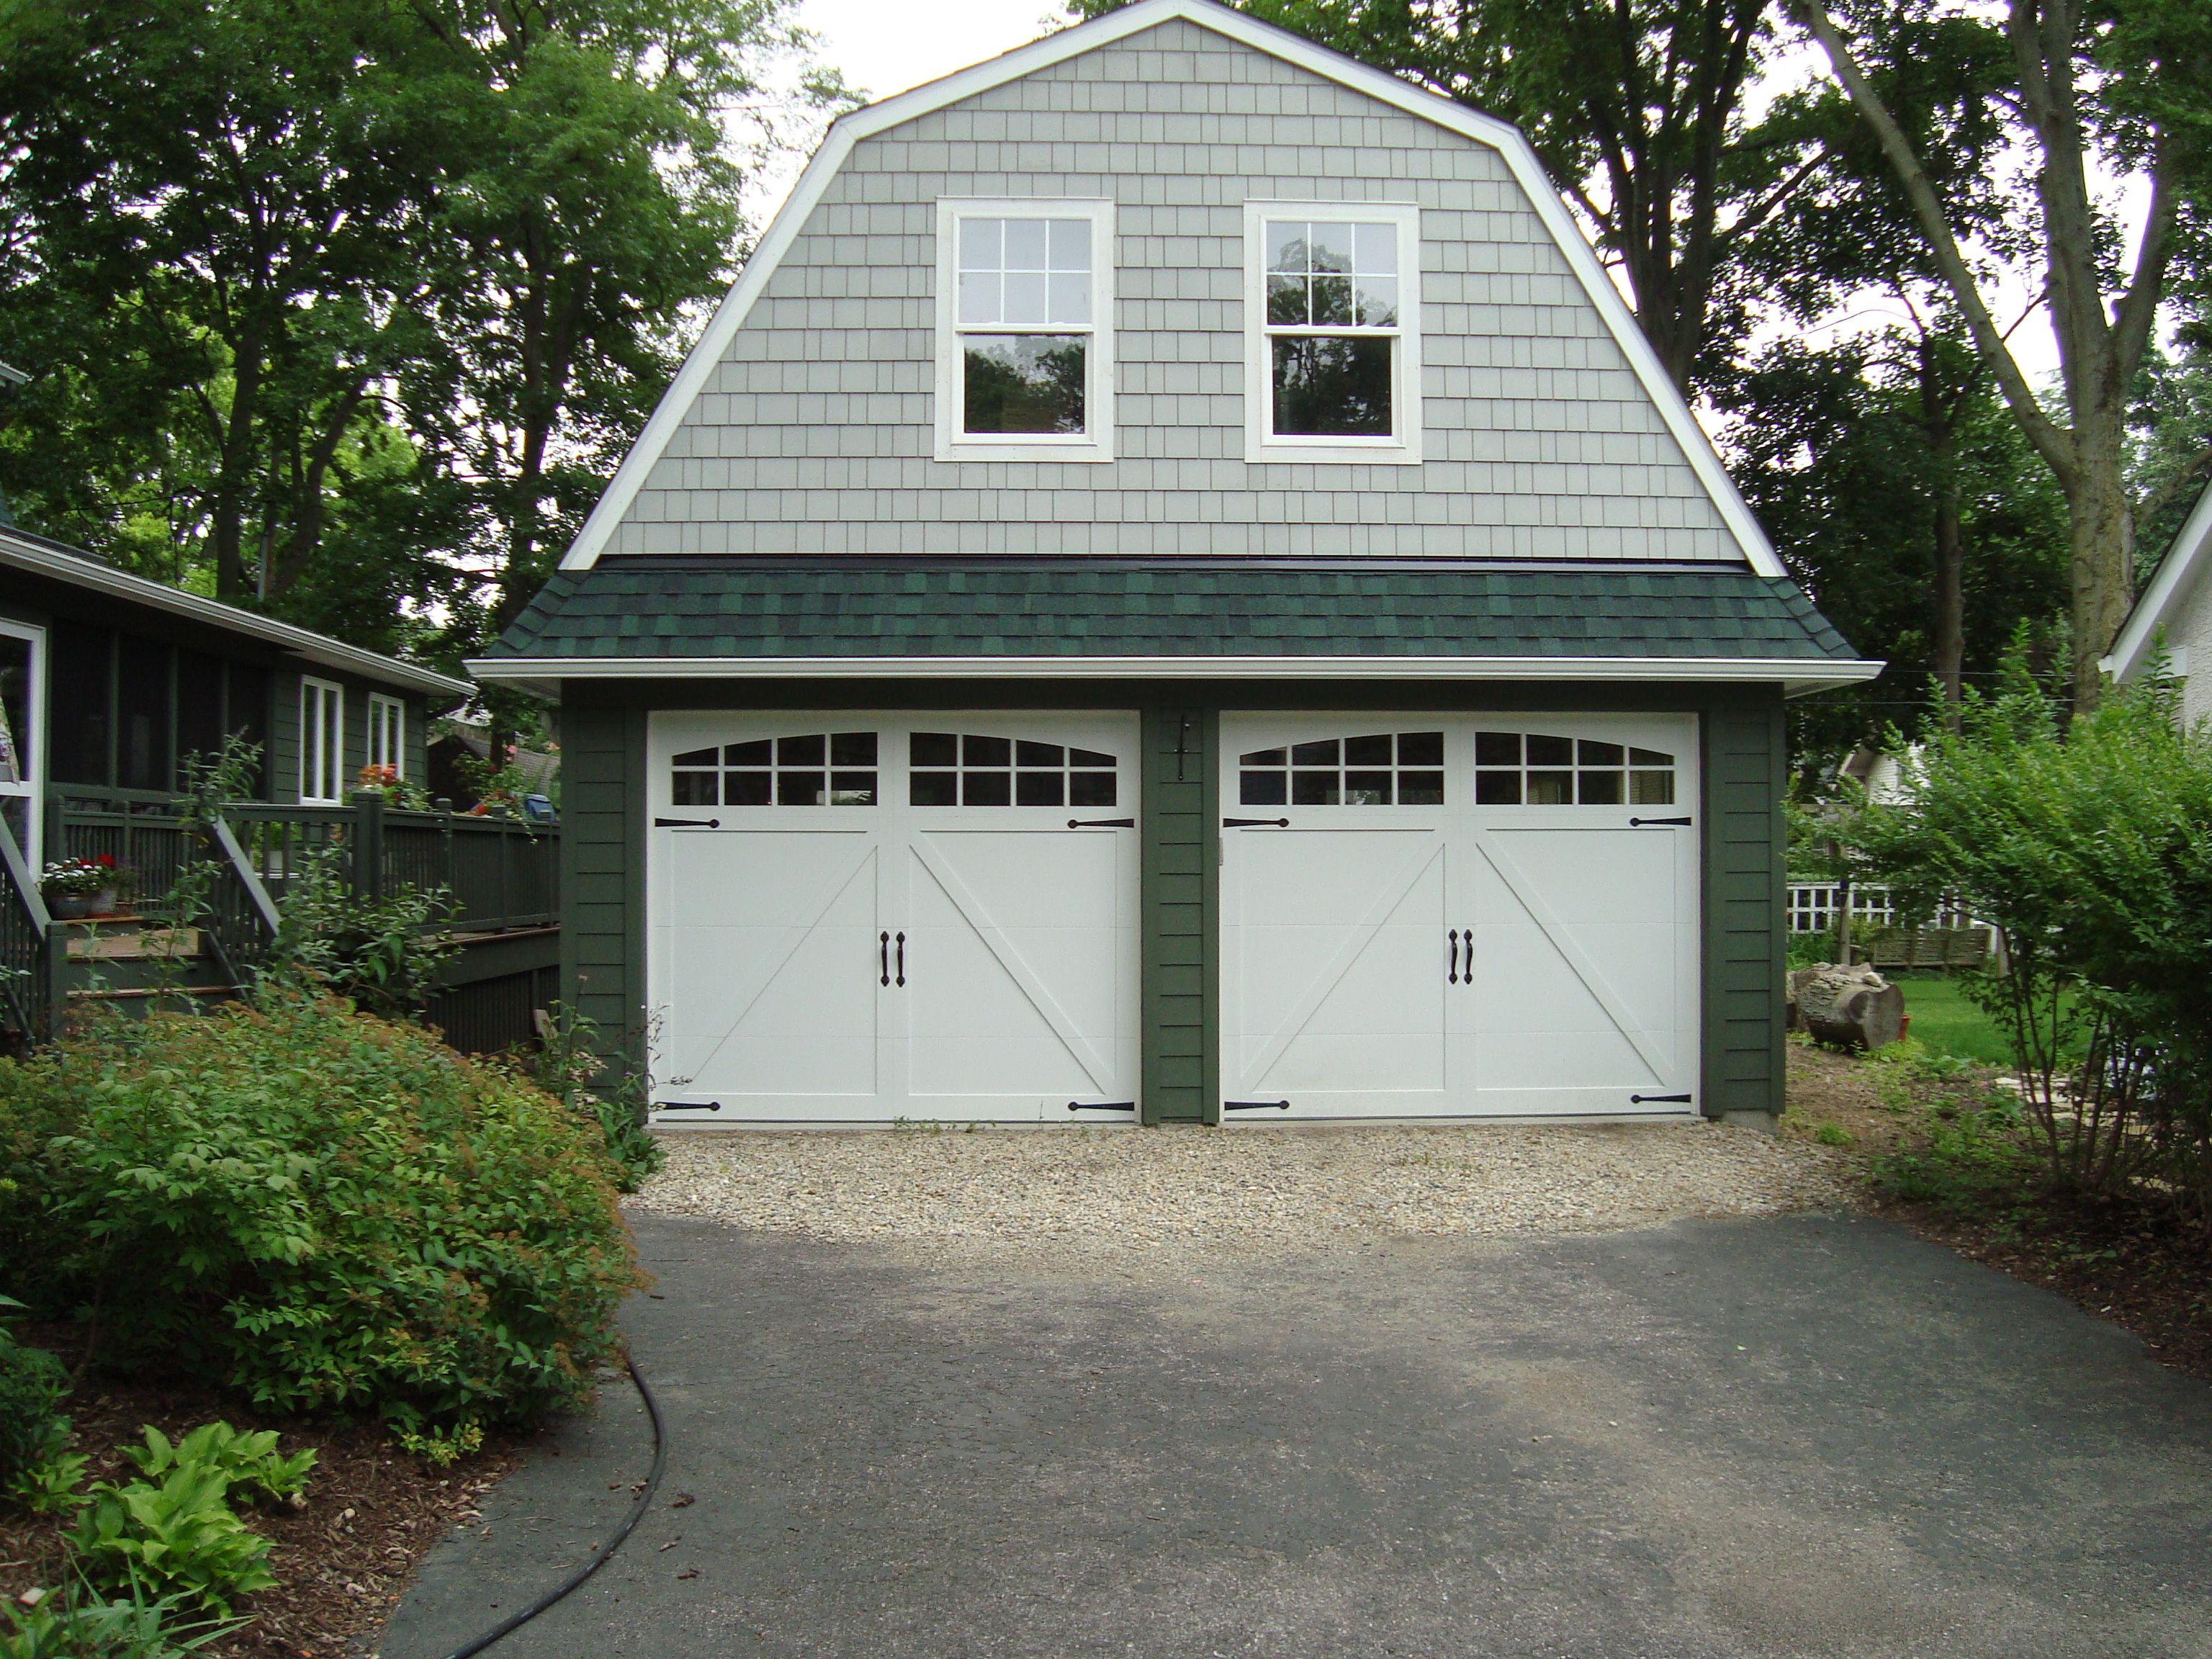 Carriage House Stamped Garage Doors Pinterestcom